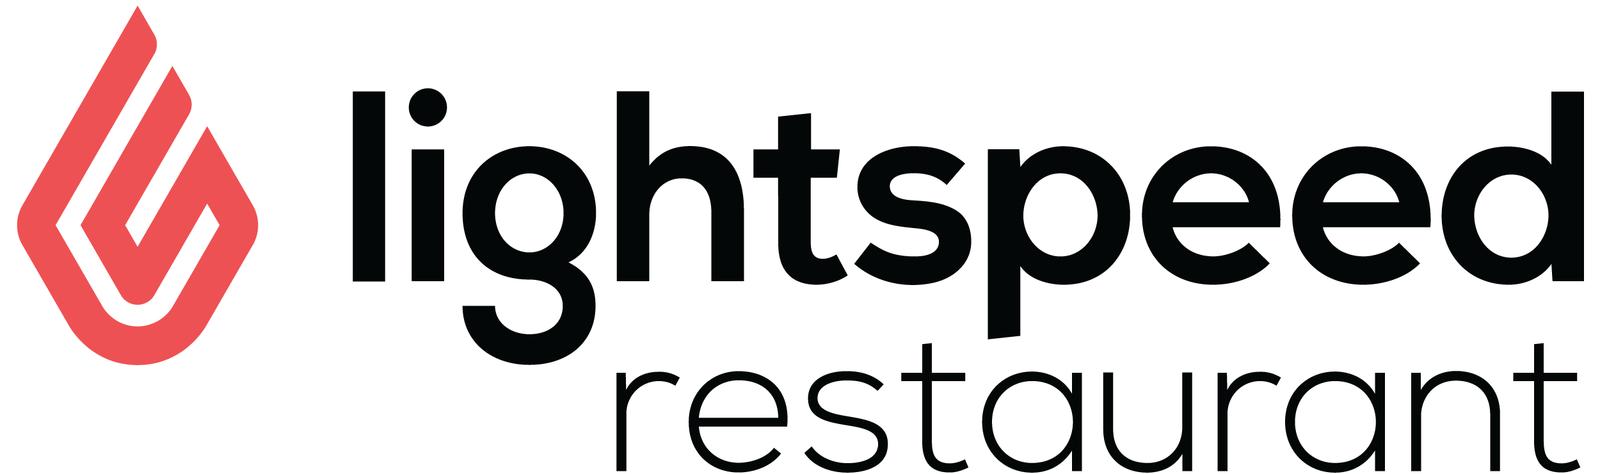 Lightspeed Restaurants logo